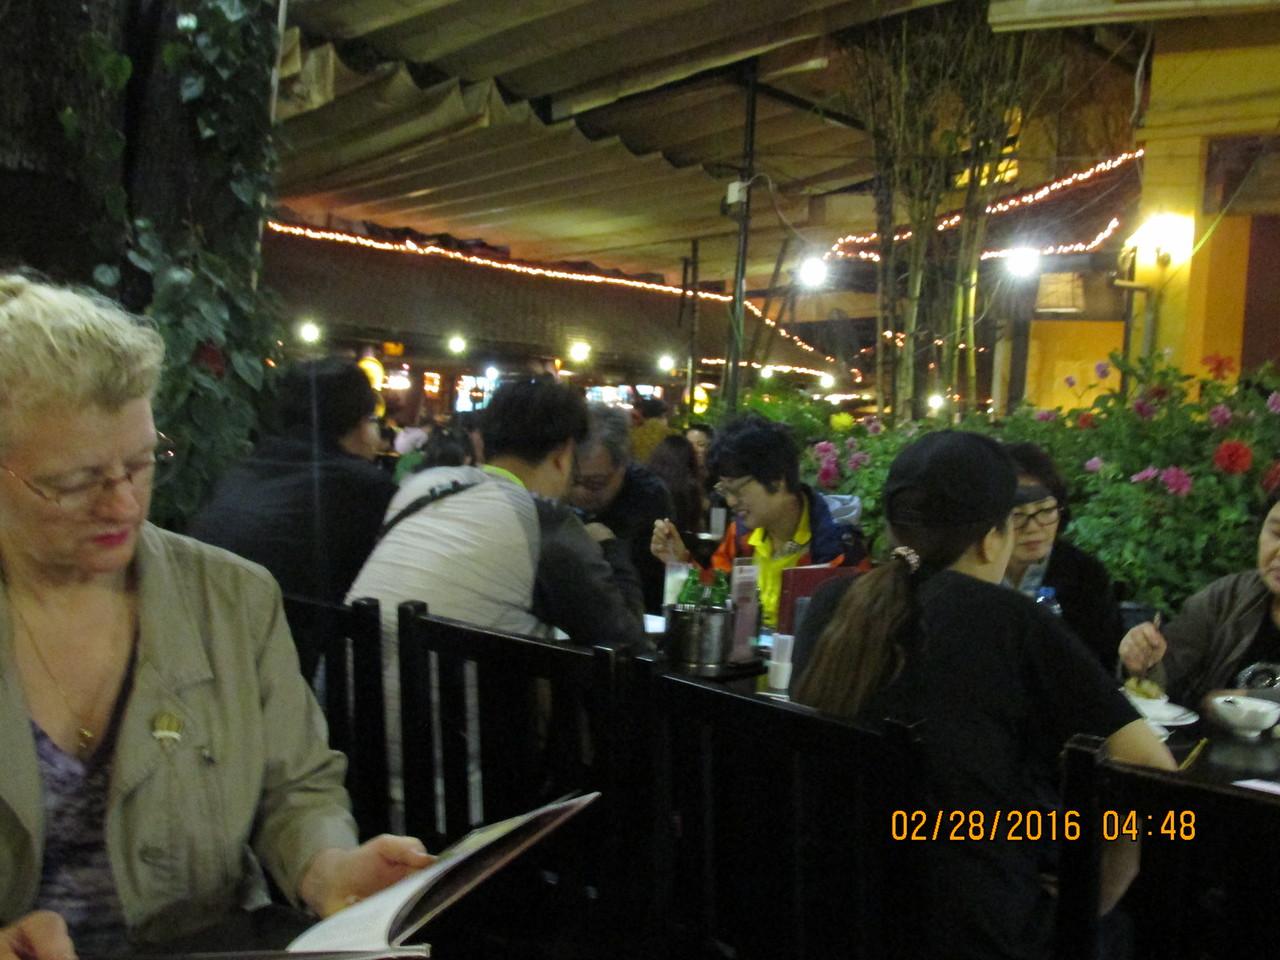 0064 - Quan An Ngon Restaurant on Phan Boi Chau - Hanoi Vietnam - Date Correct but Time on Pic is Wrong